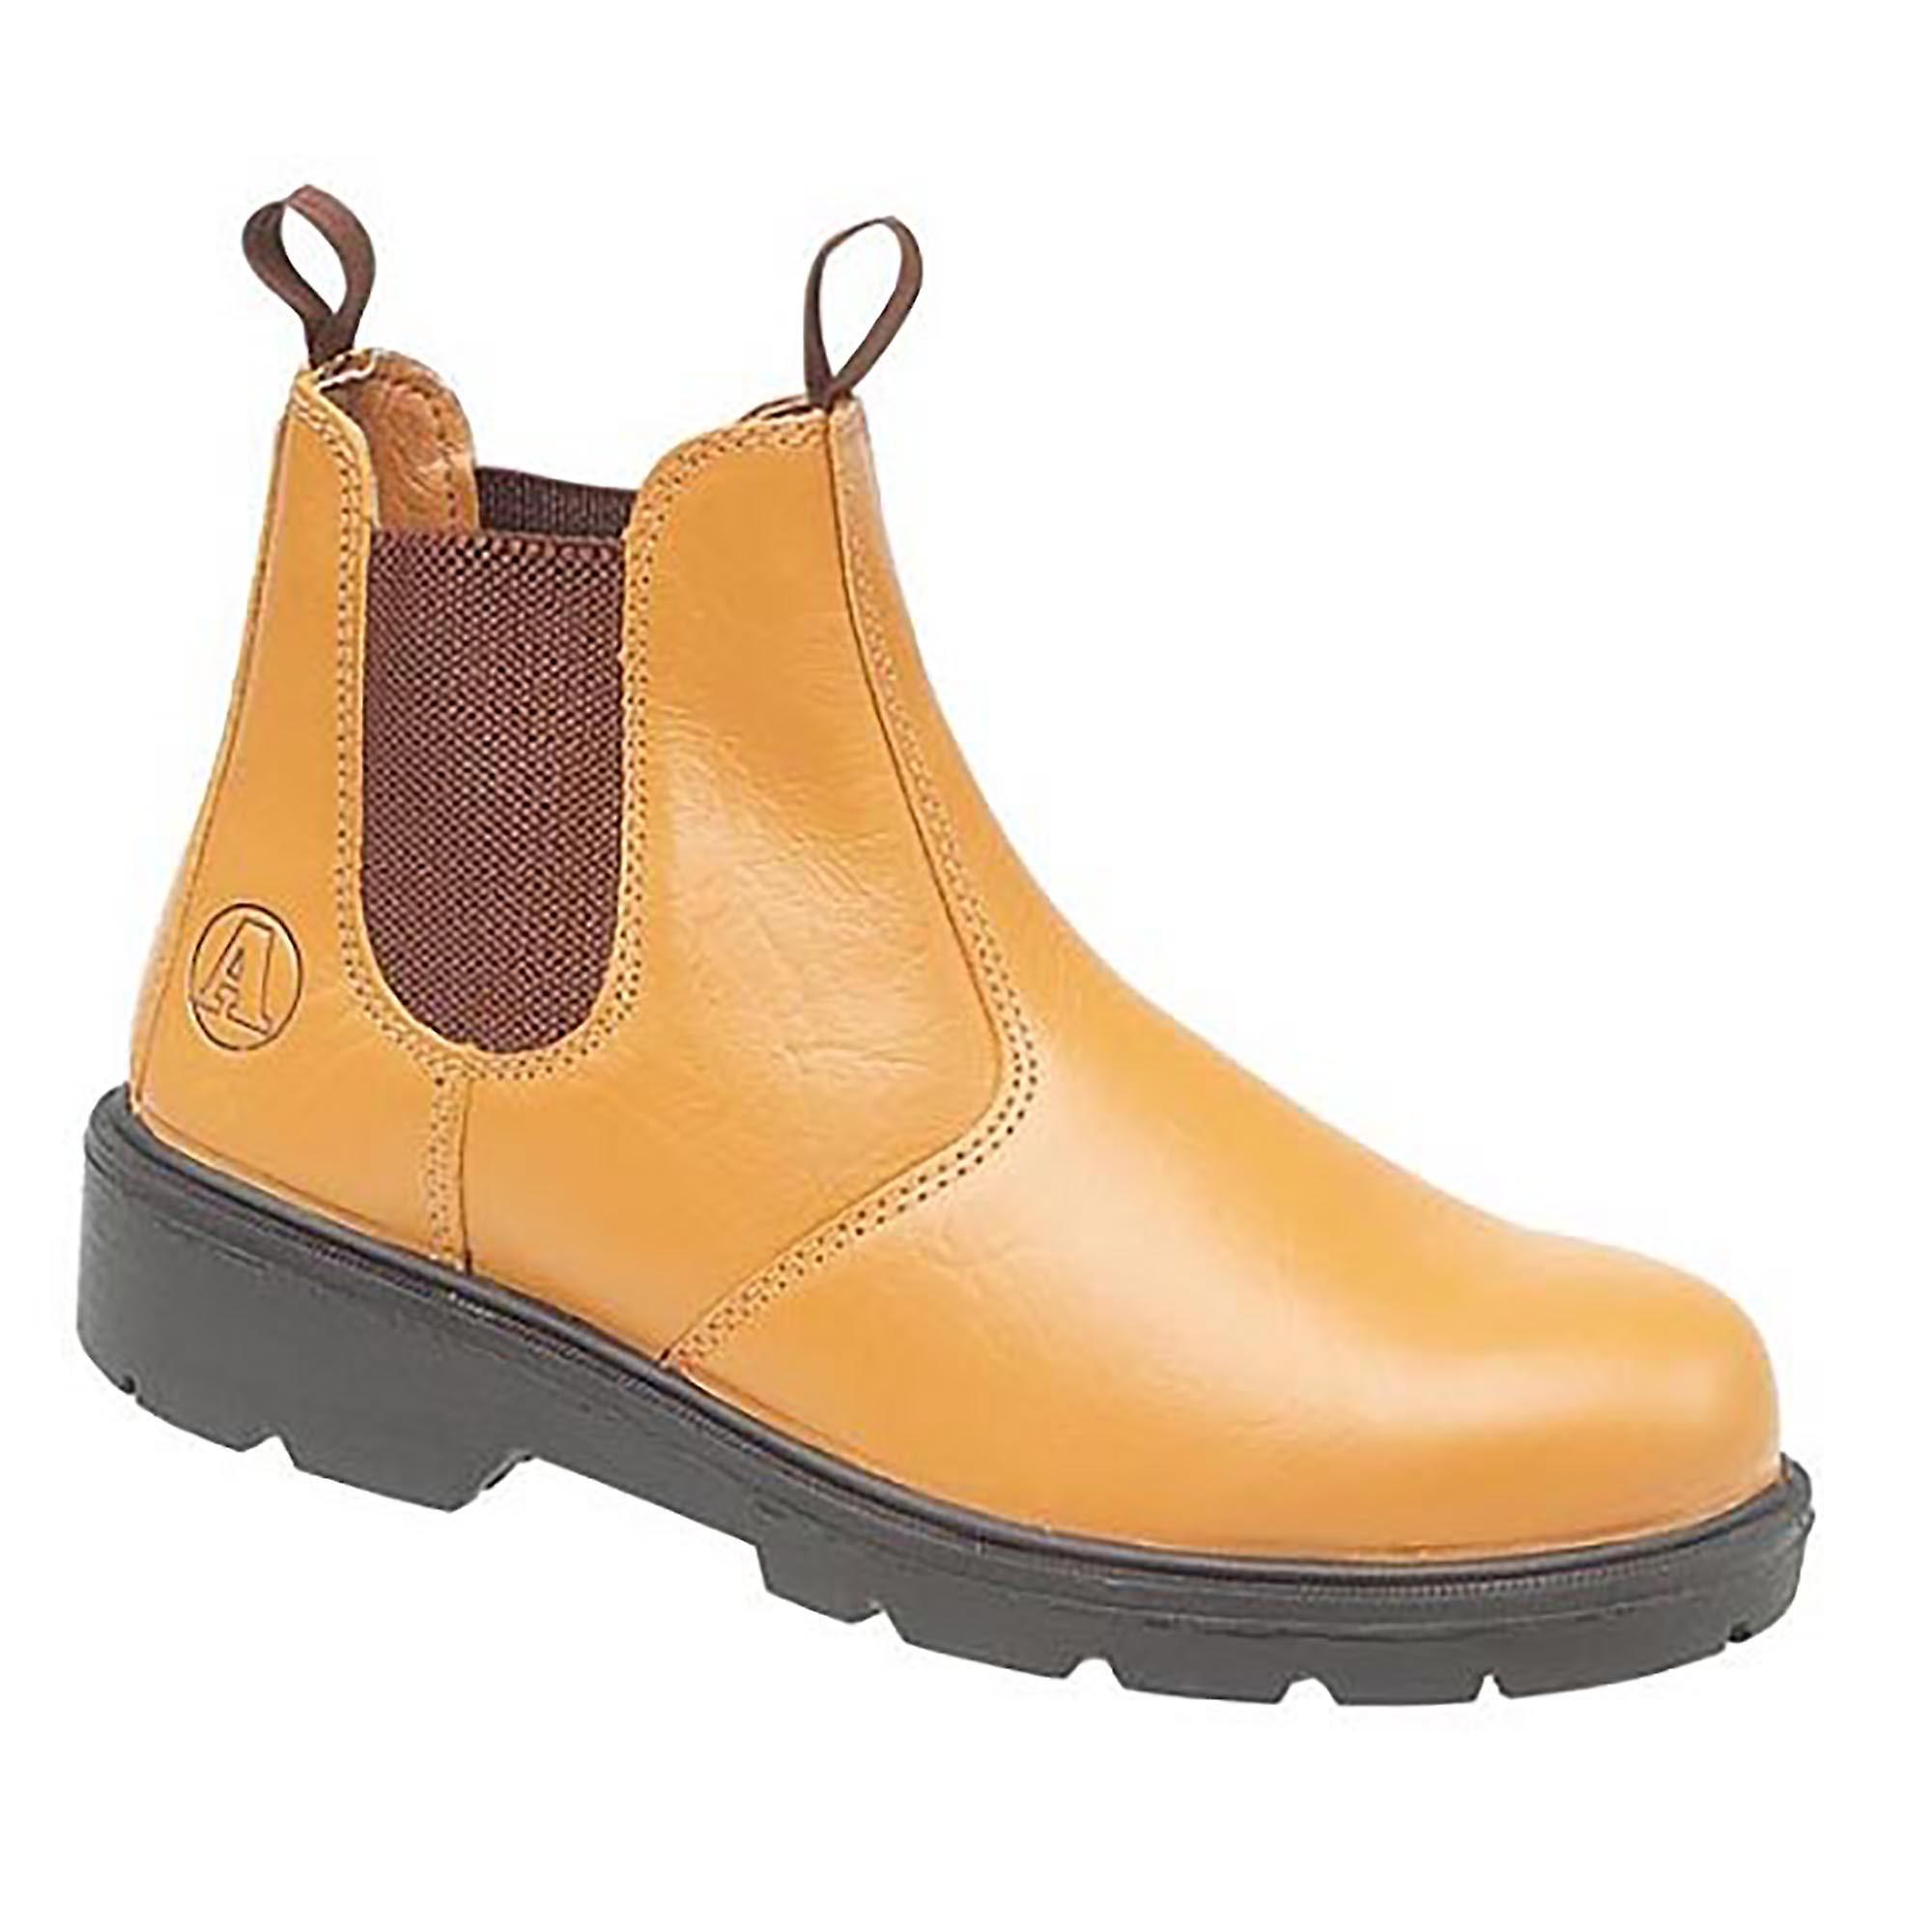 Amblers Steel Fs115 Pull-on Dealer Boot / Womens Ladies Boots